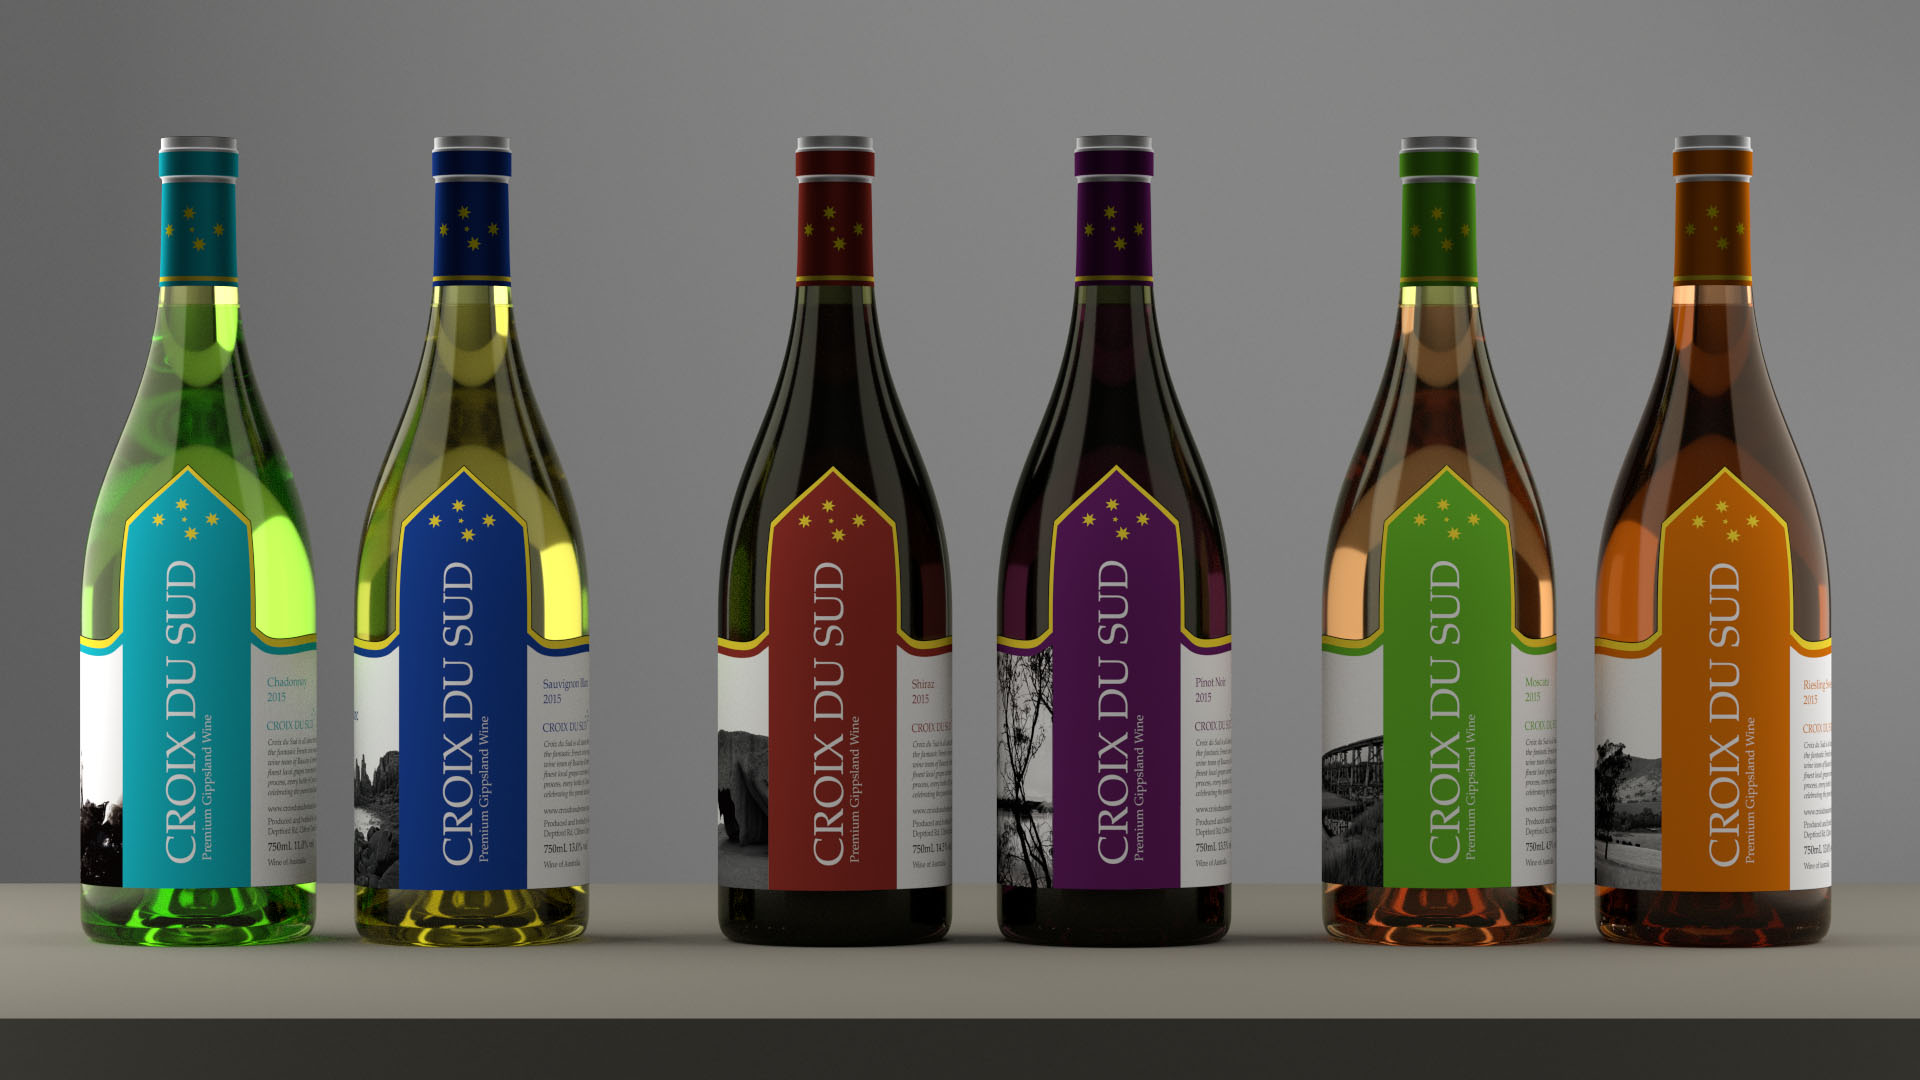 CROIX DU SUD – West Gippsland Wine